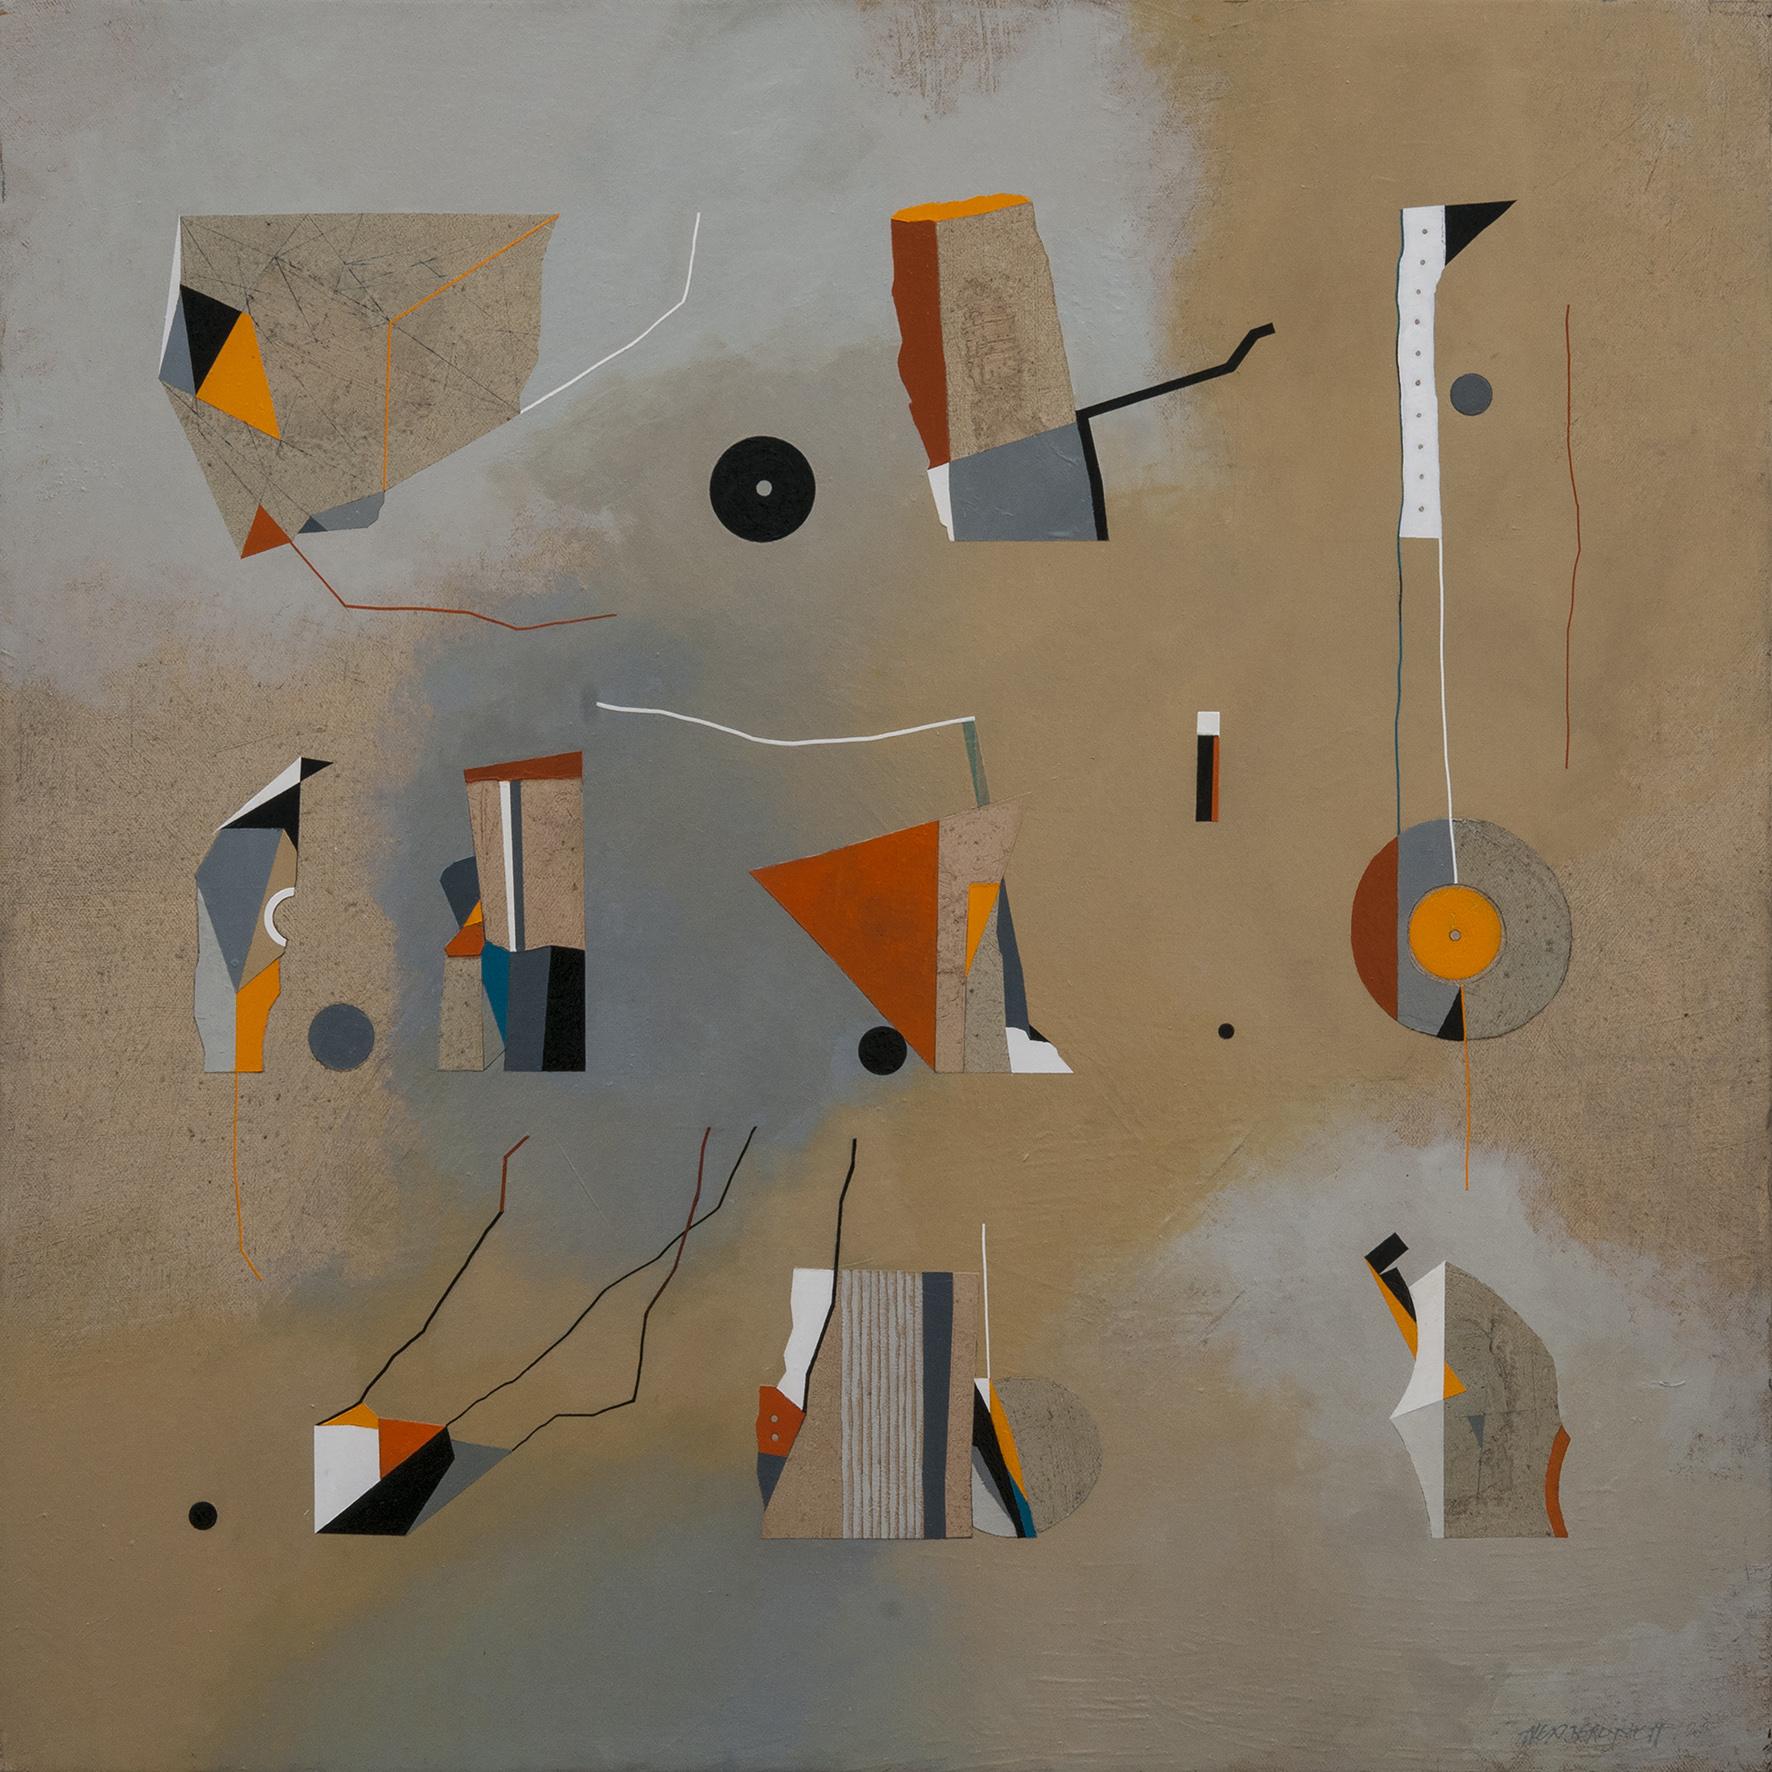 Playground, oil on canvas, 85x85 cm, 2015